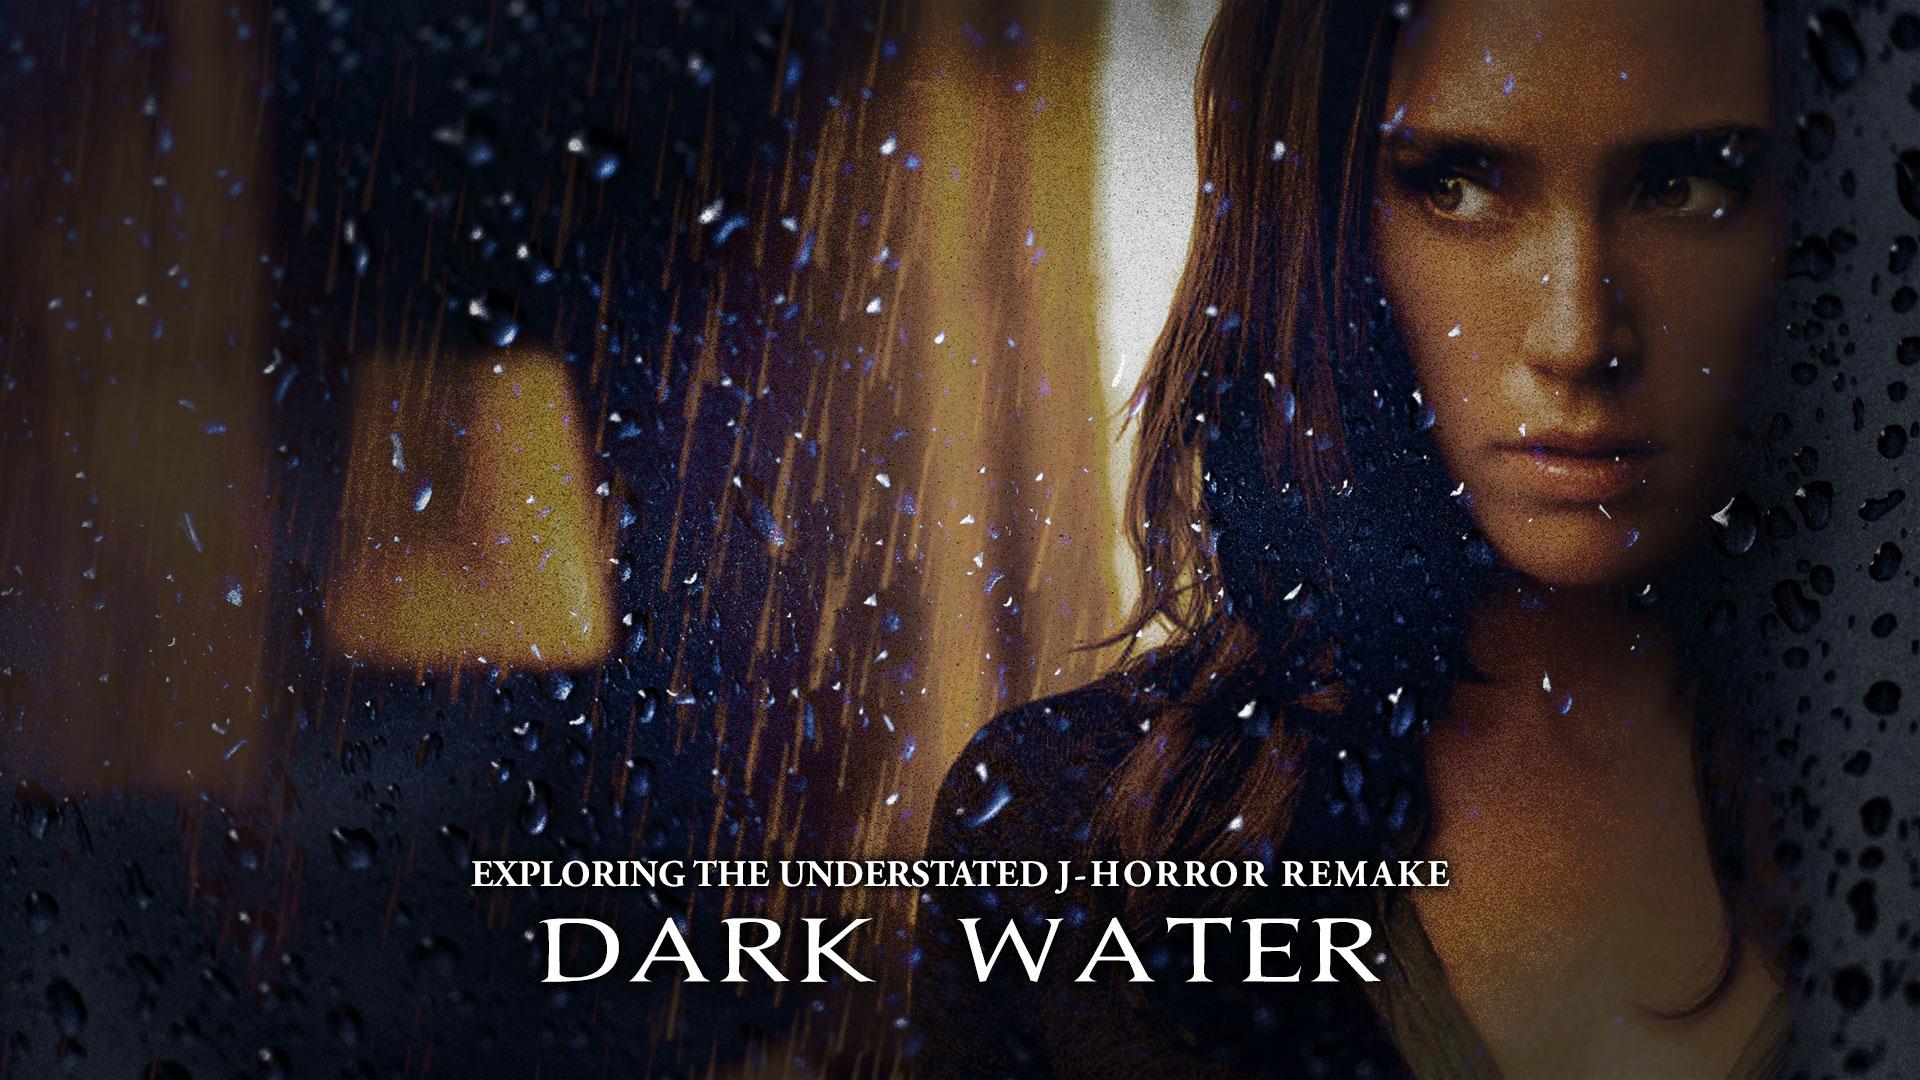 HORRORWOOD™ Presents... 'Exploring the Understated J-horror Remake 'Dark Water''